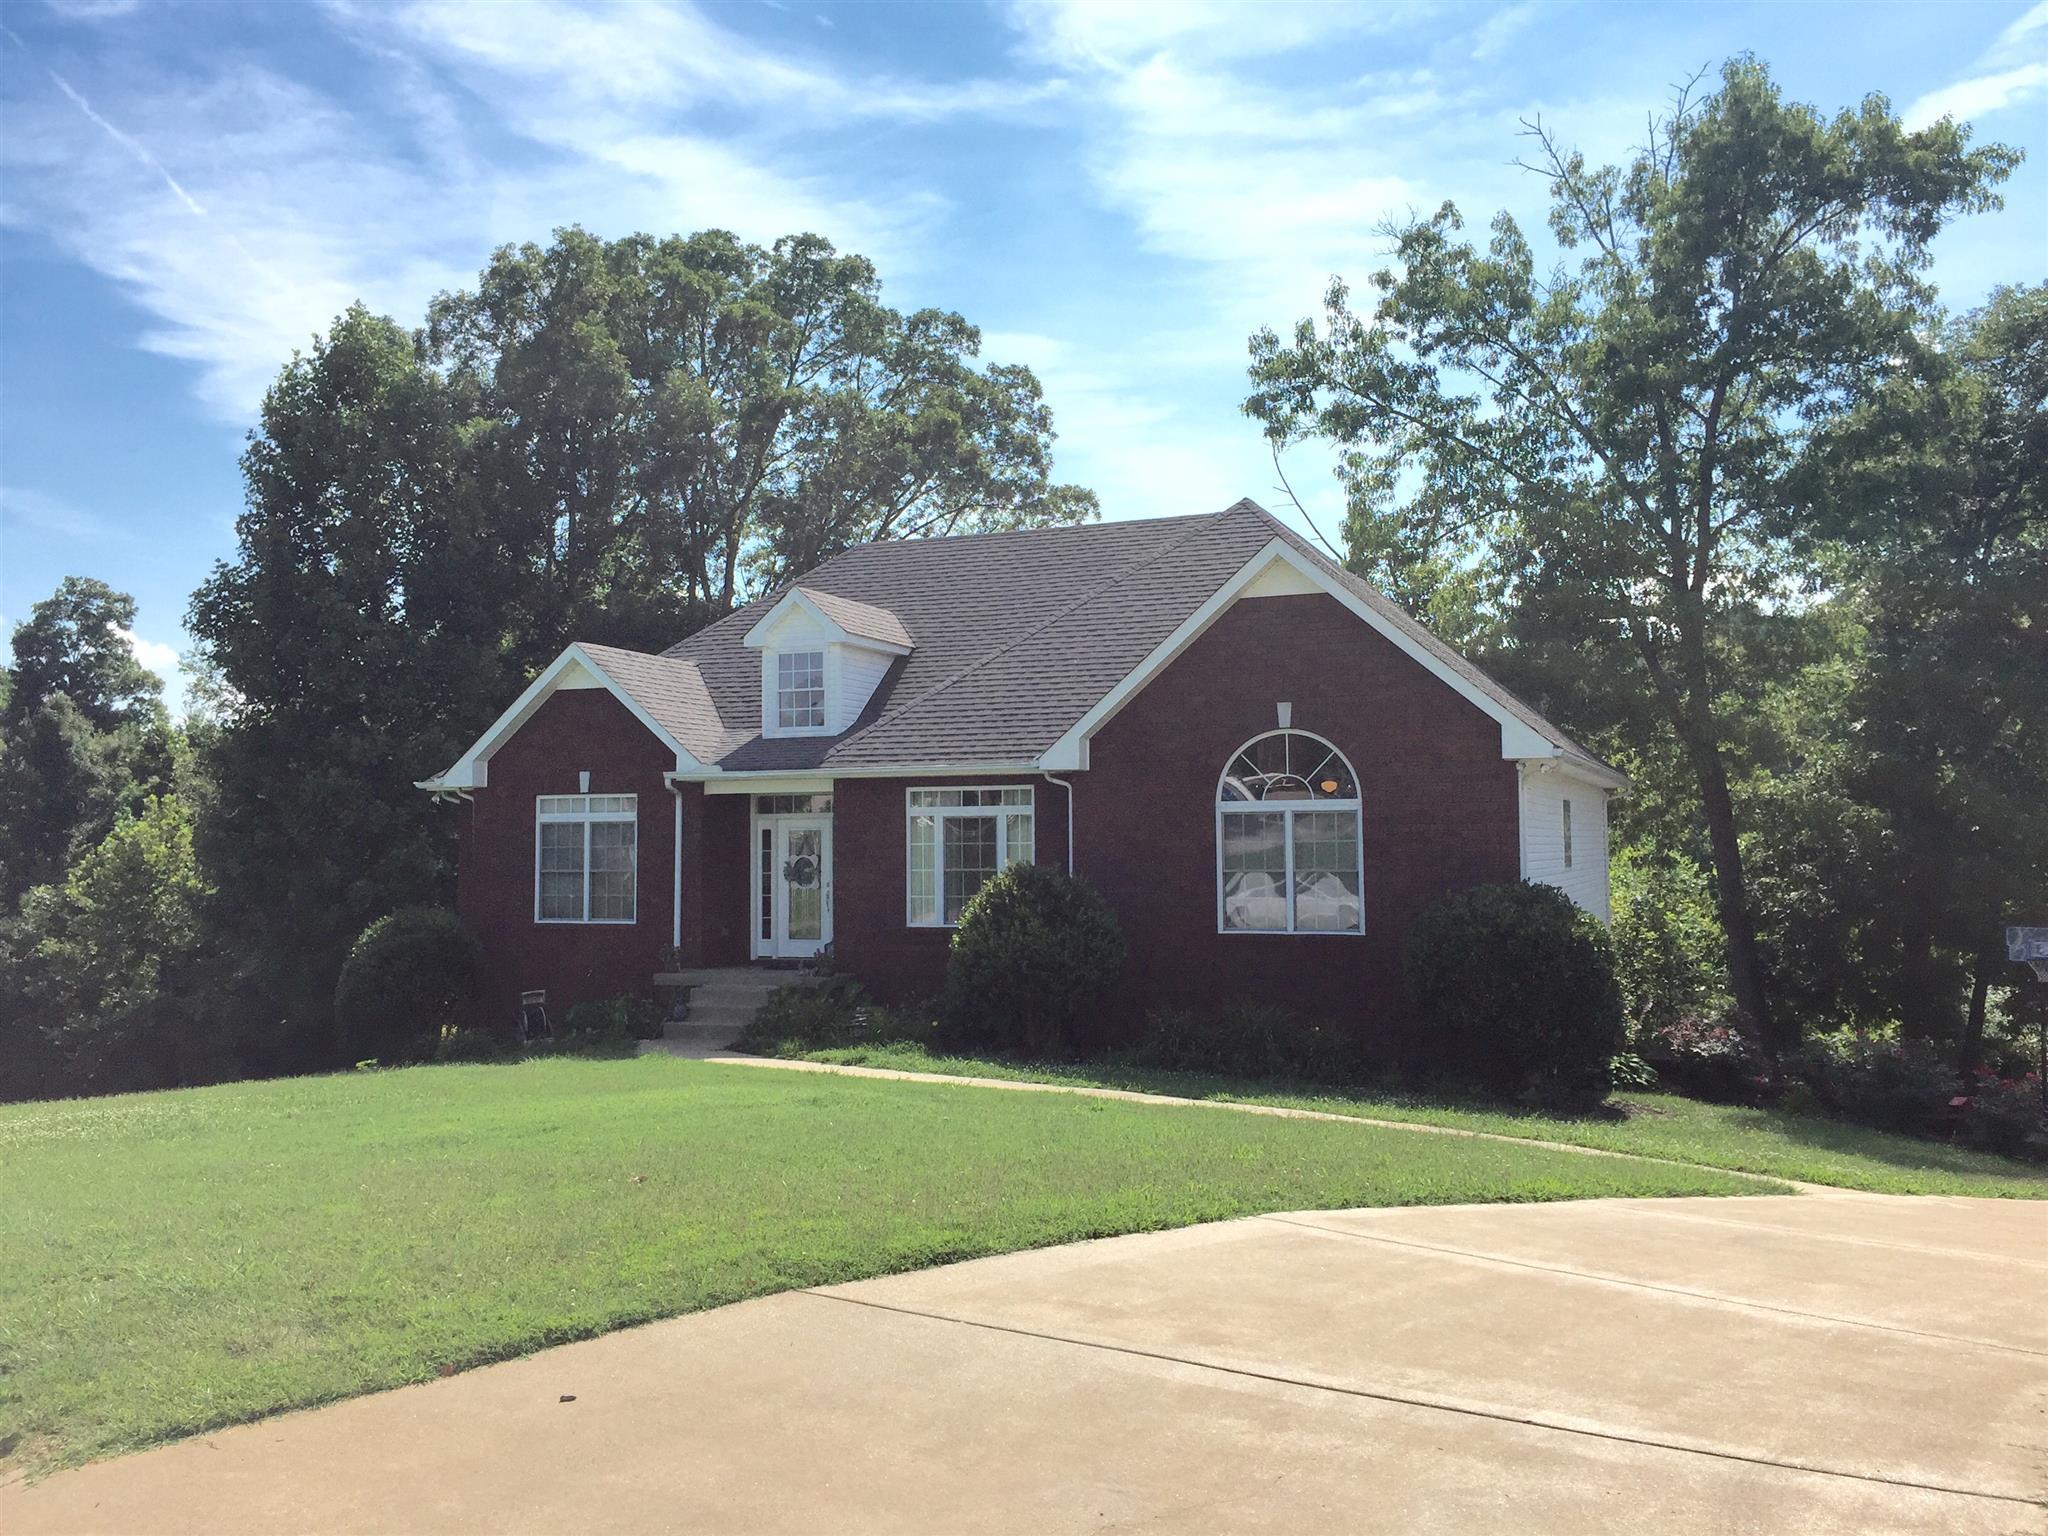 1128 Rustling Oaks Dr, Pleasant View, TN 37146